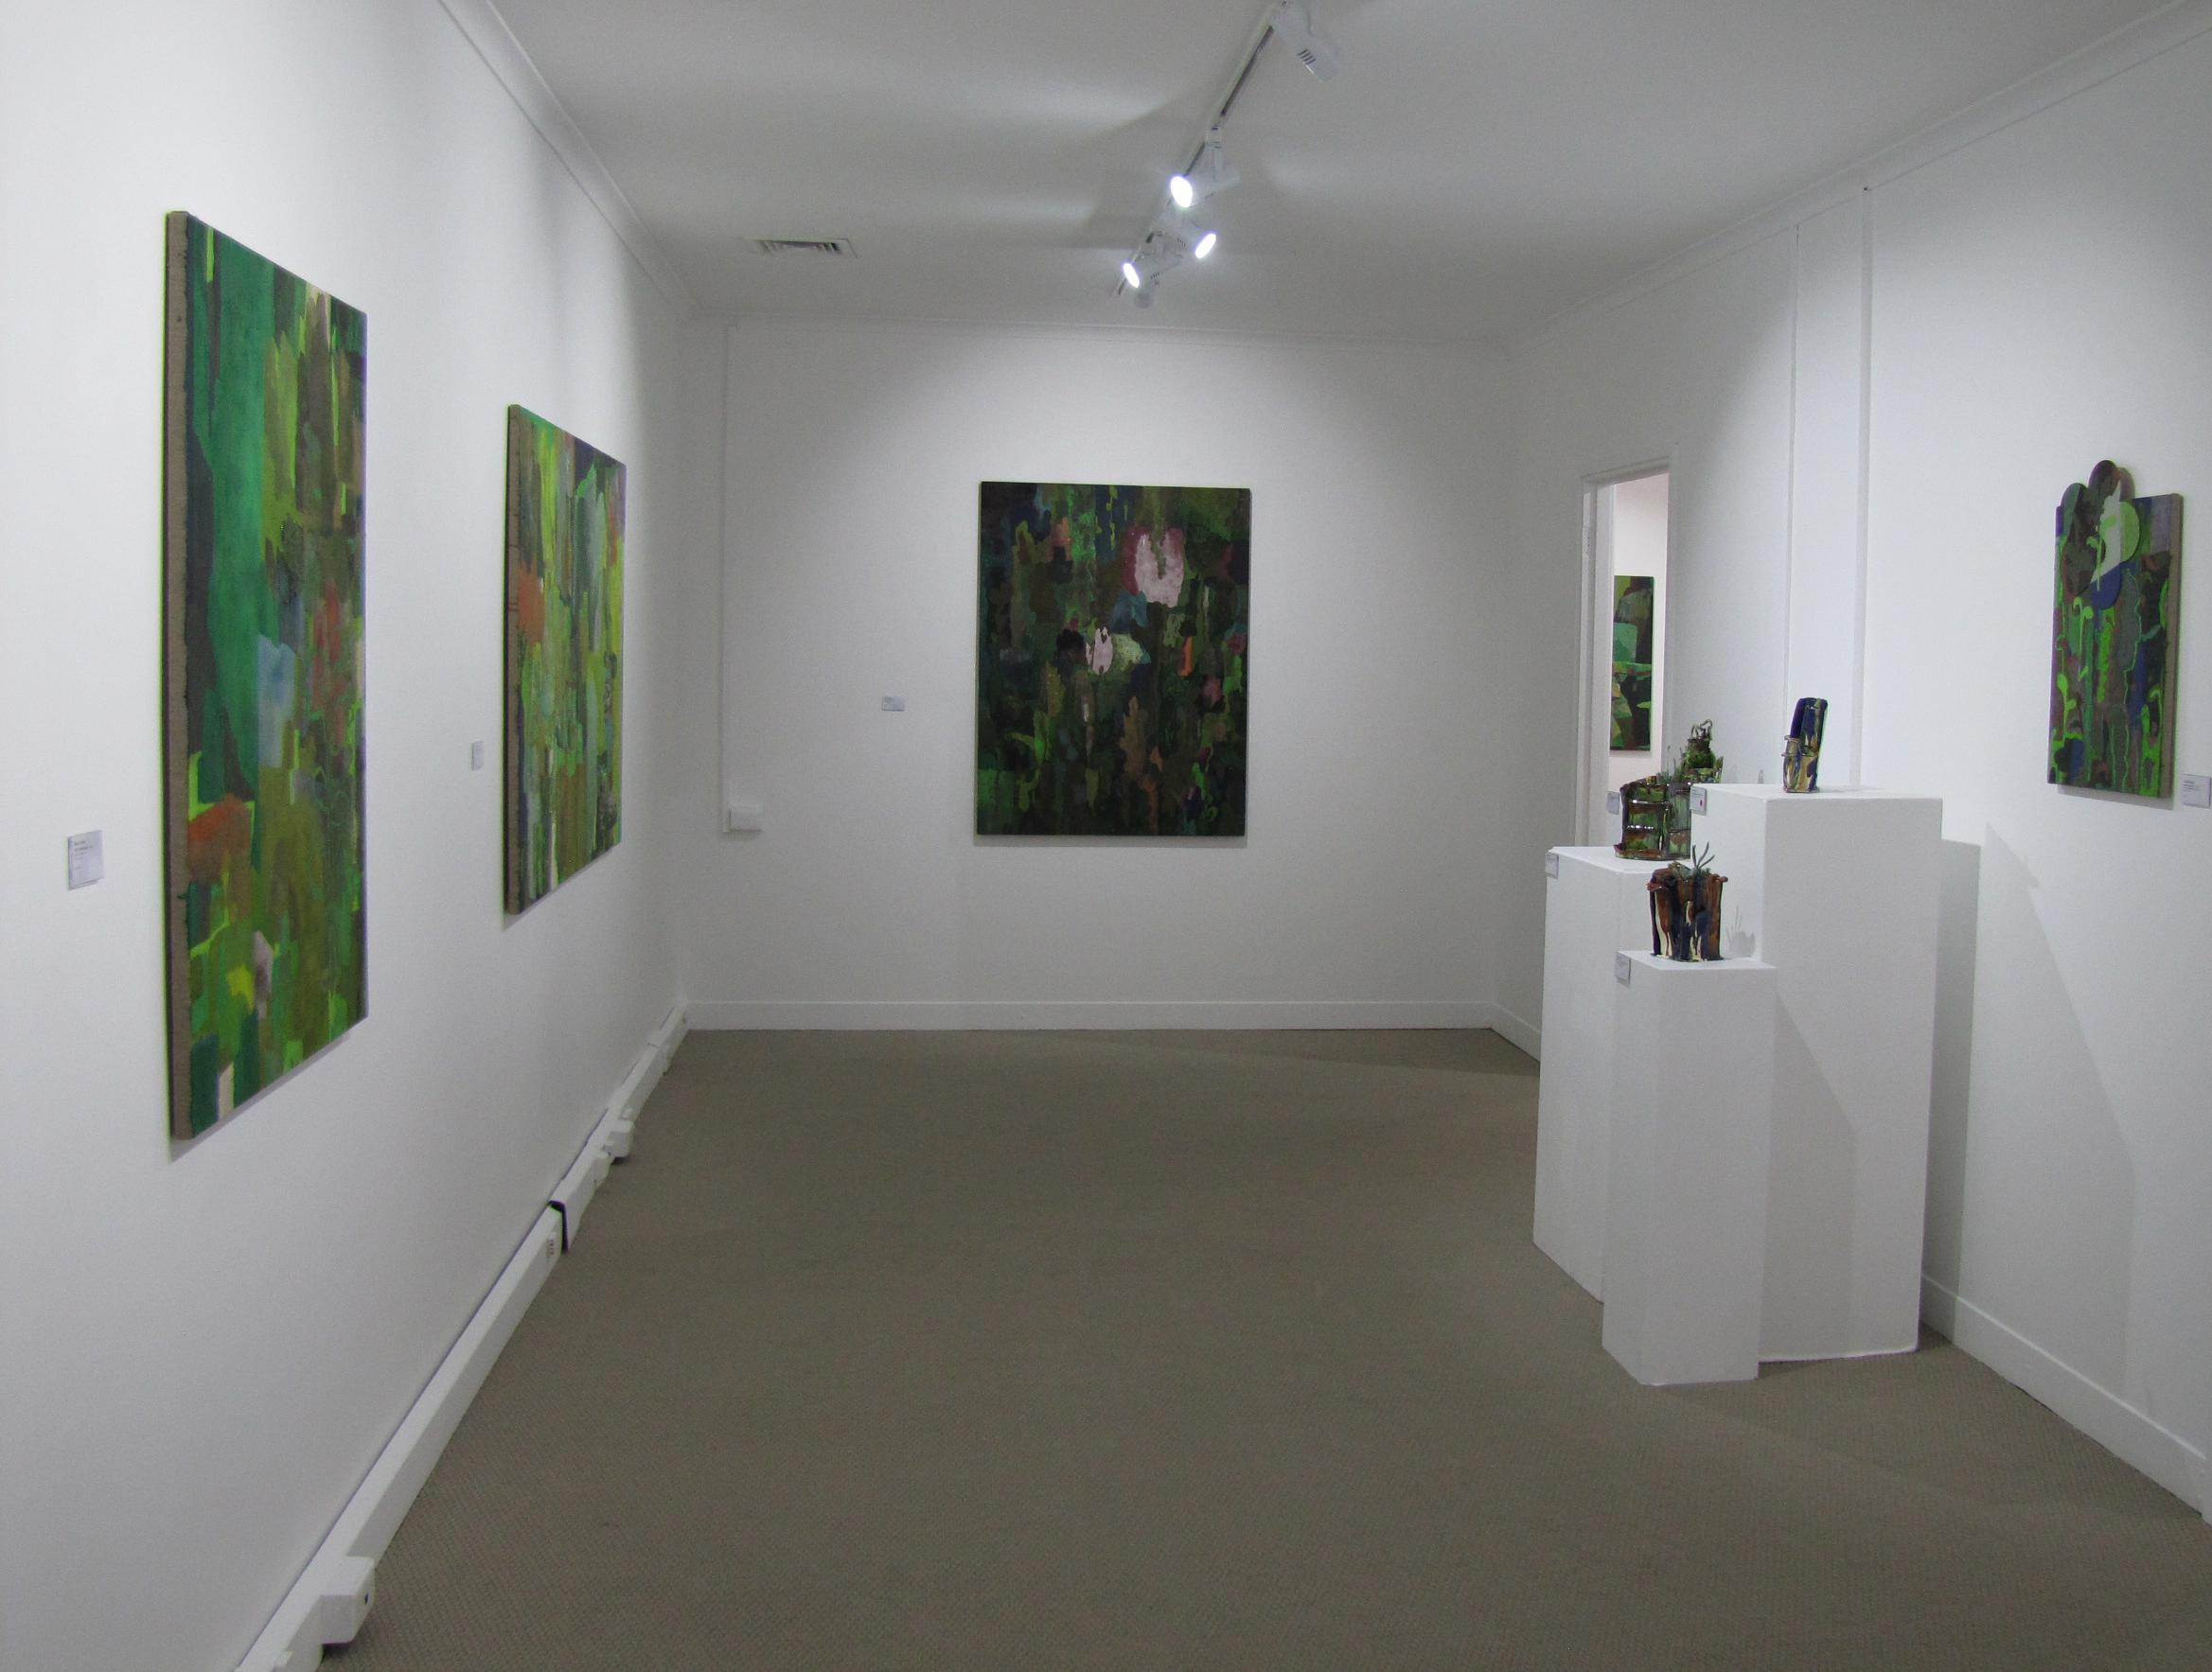 NSG. Waller 2 exhibition. Exhibition views 3.jpg